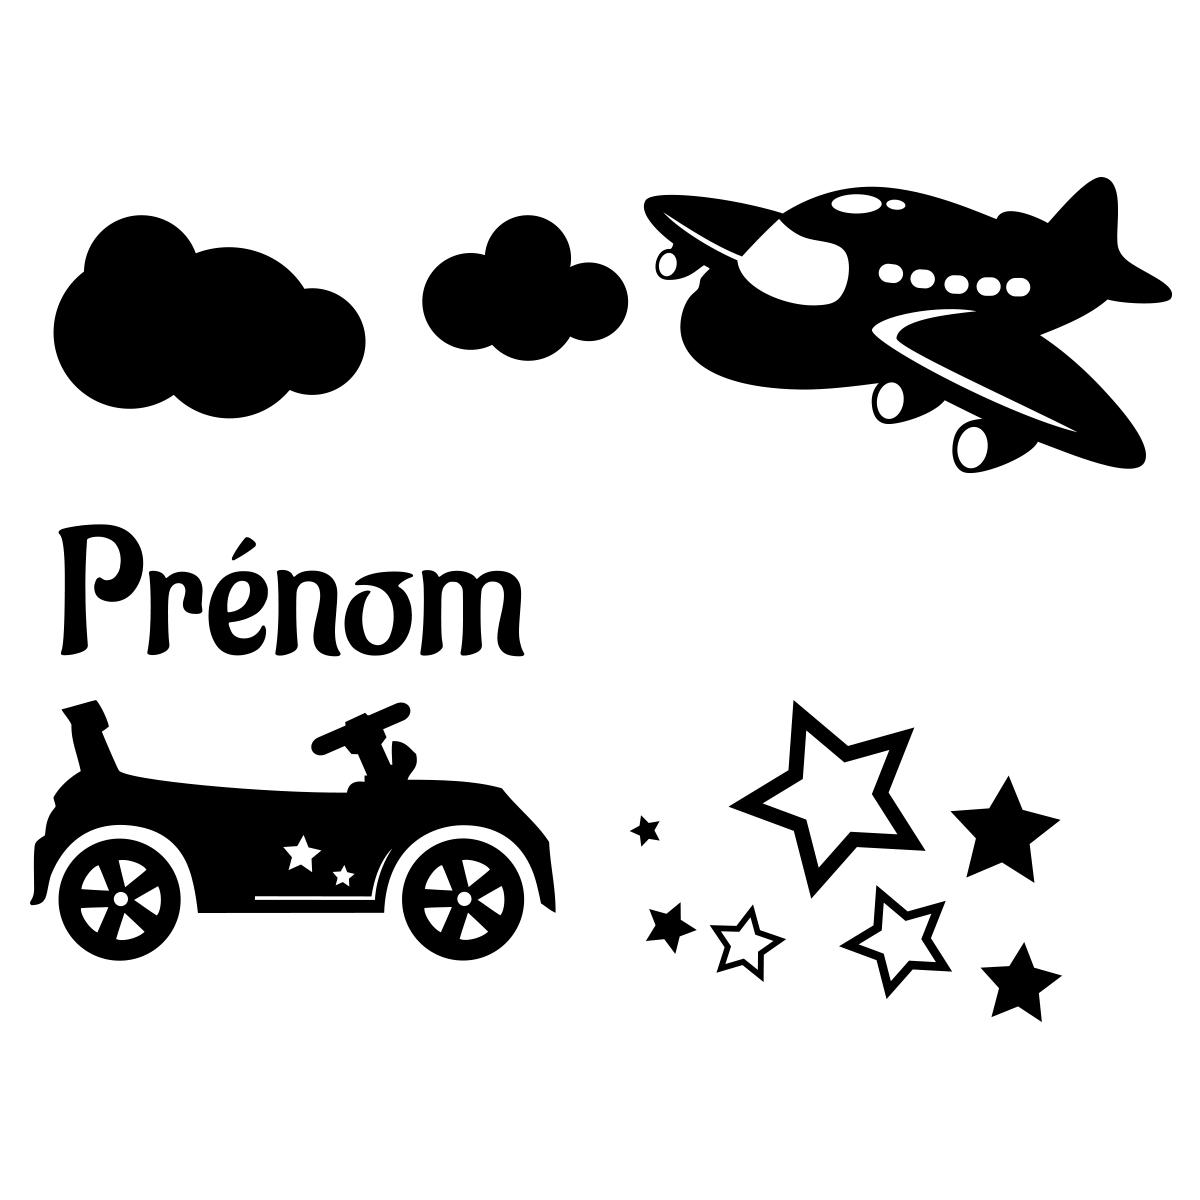 sticker pr nom personnalisable voiture et avion chambre enfants pr noms ambiance sticker. Black Bedroom Furniture Sets. Home Design Ideas